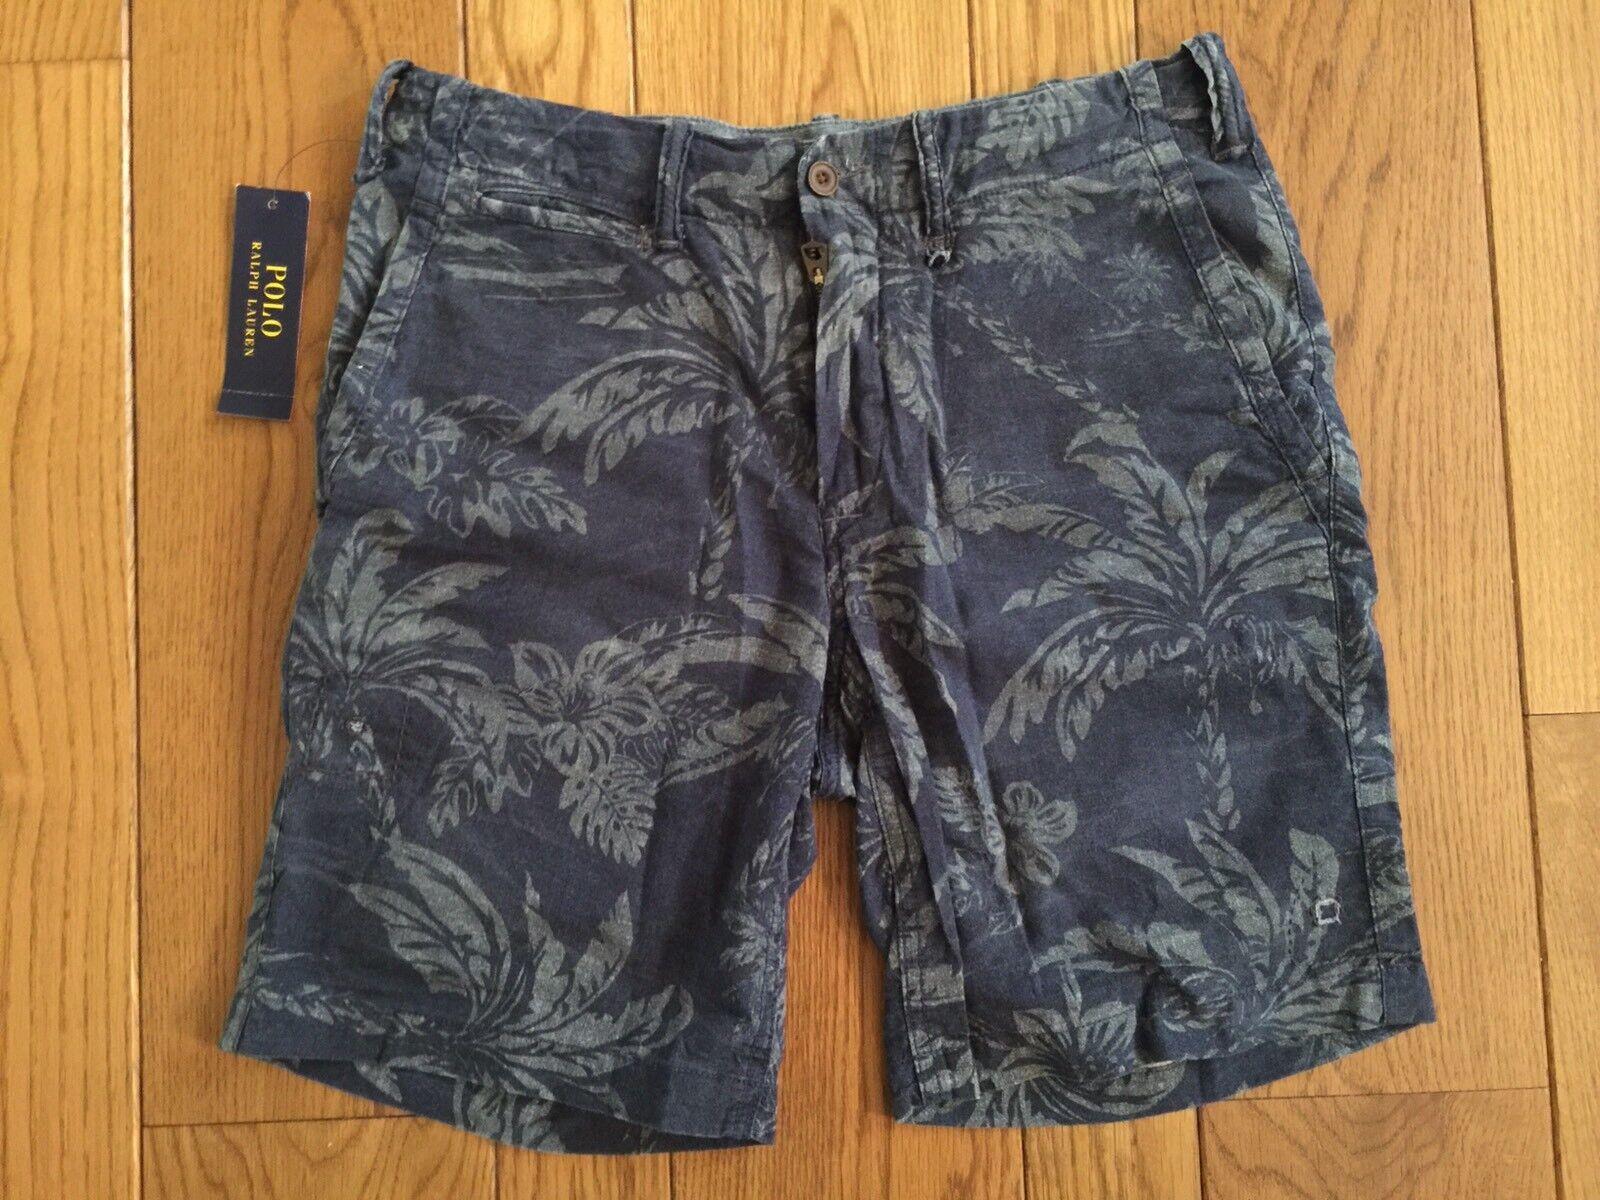 Polo Ralph Lauren Straight Fit STUDIO Navy Hawaii Print Cotton Shorts 28 NWT